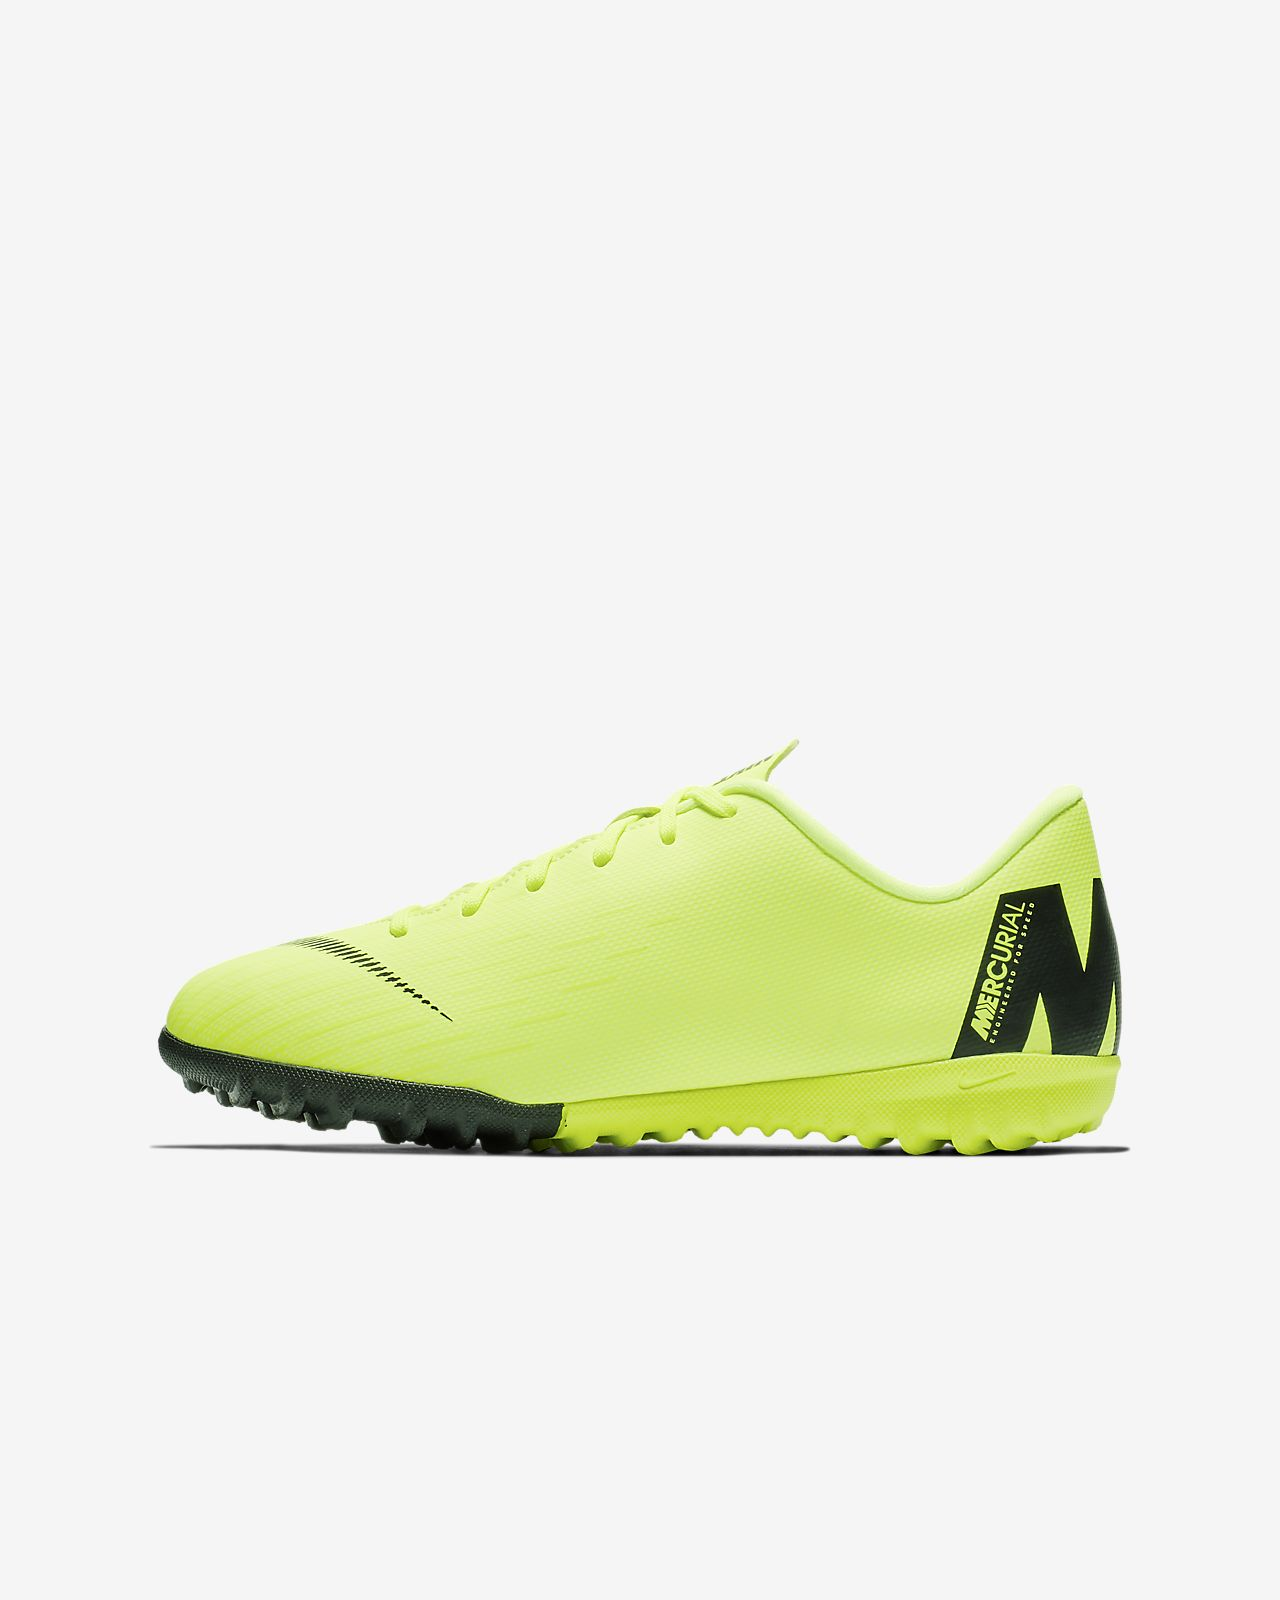 Nike Jr. MercurialX Vapor XII Academy Fußballschuh für Turf für jüngere/ältere Kinder